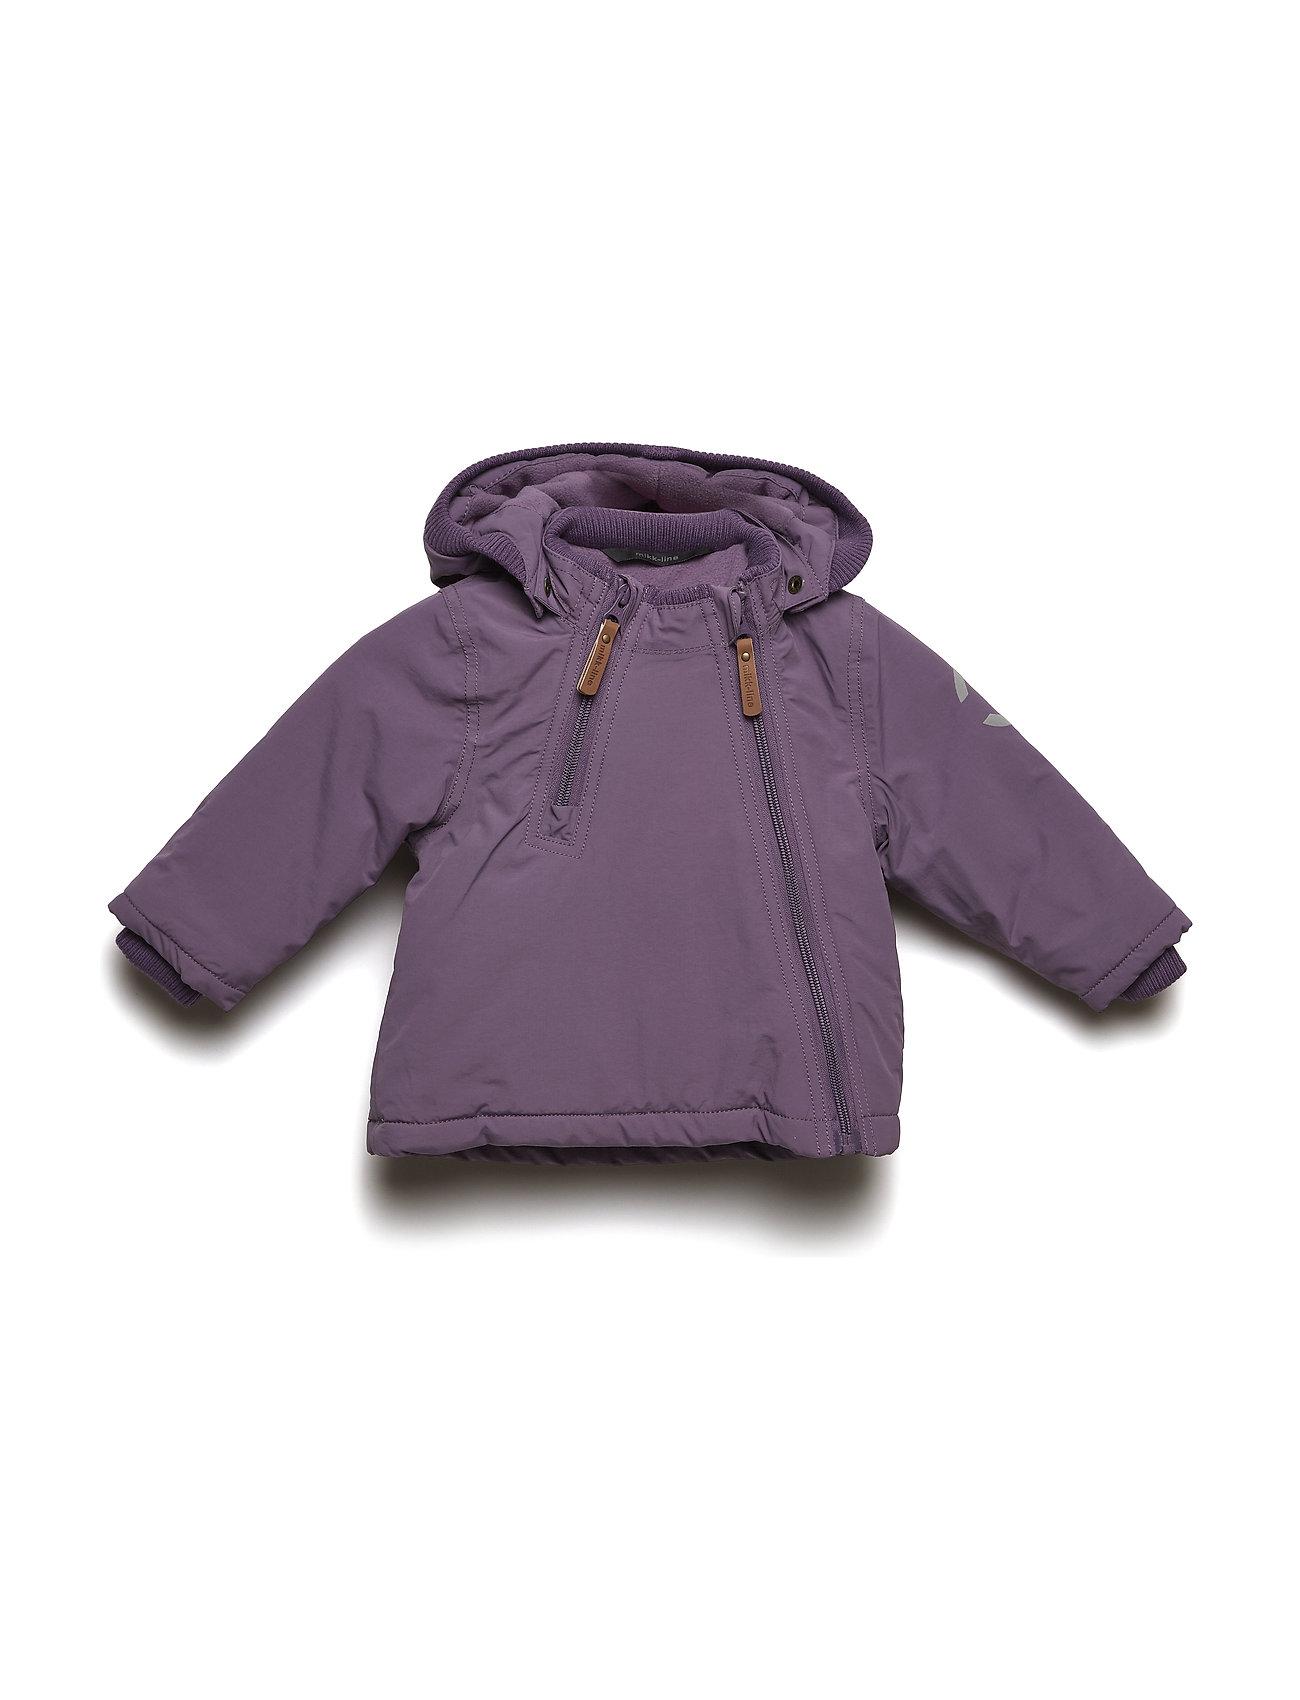 18a0062c Nylon Baby Jacket - Solid til i CHINA BLUE - Pashion.dk